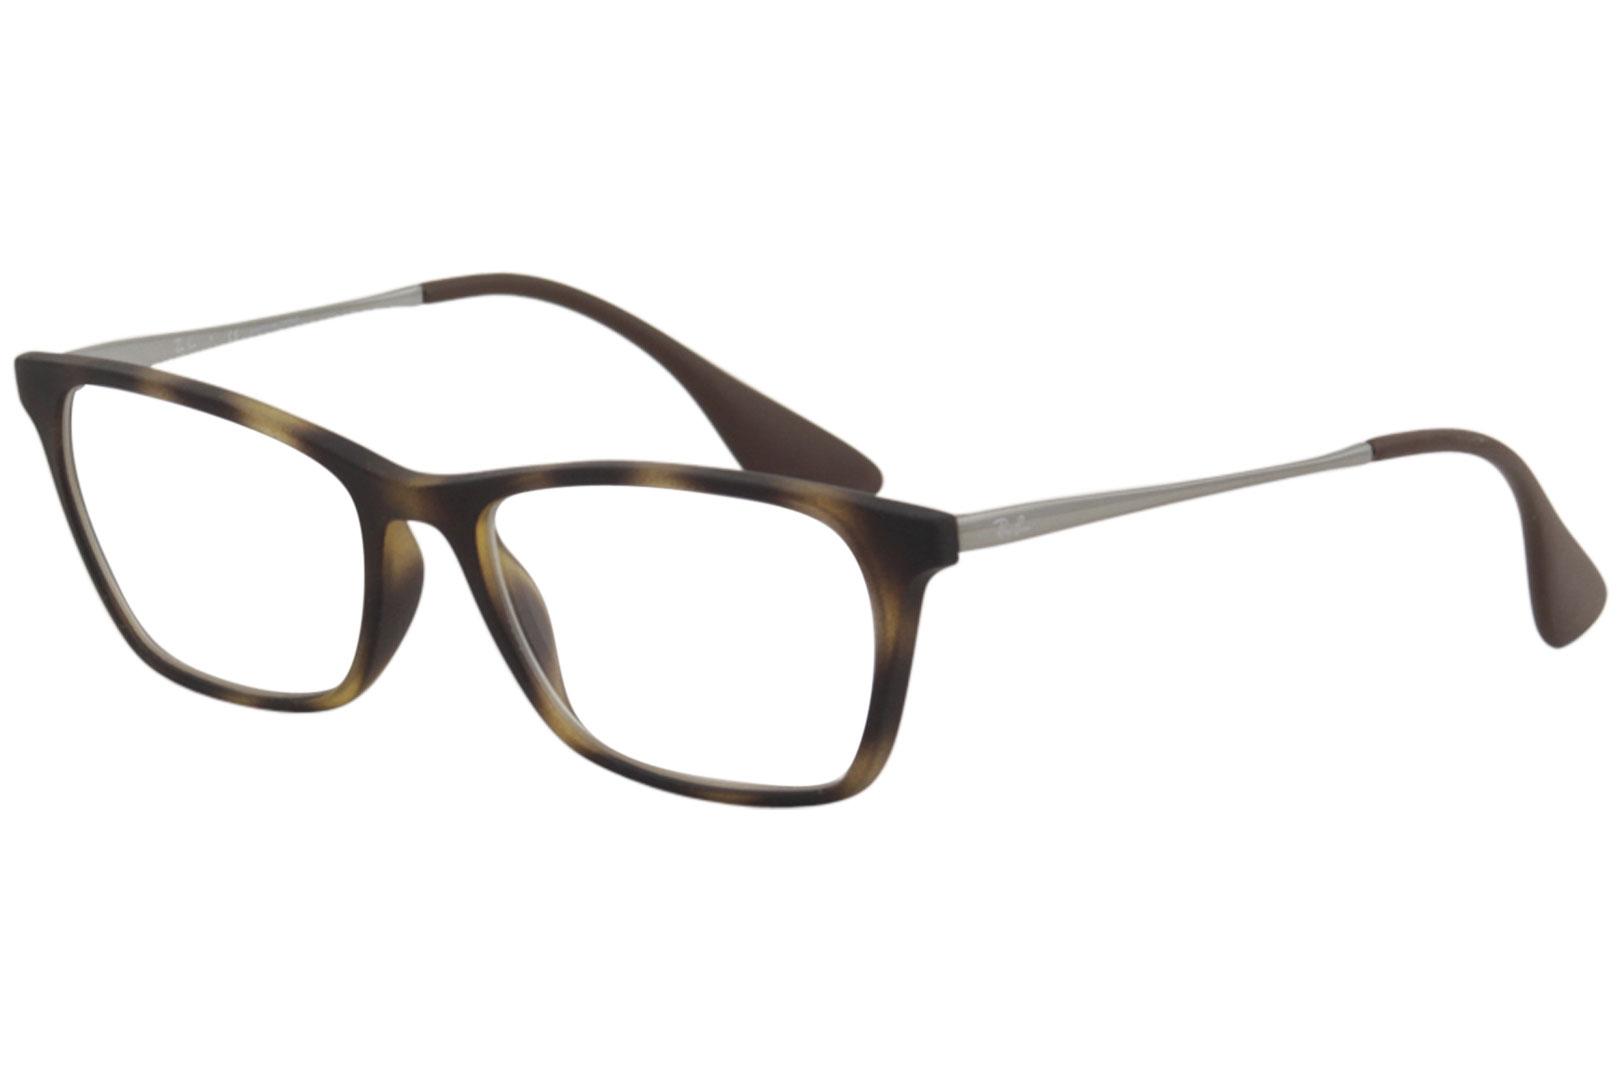 2757dc4845 Ray Ban Men s Eyeglasses RX7053F RB 7053 F 5365 Rubber Havana ...